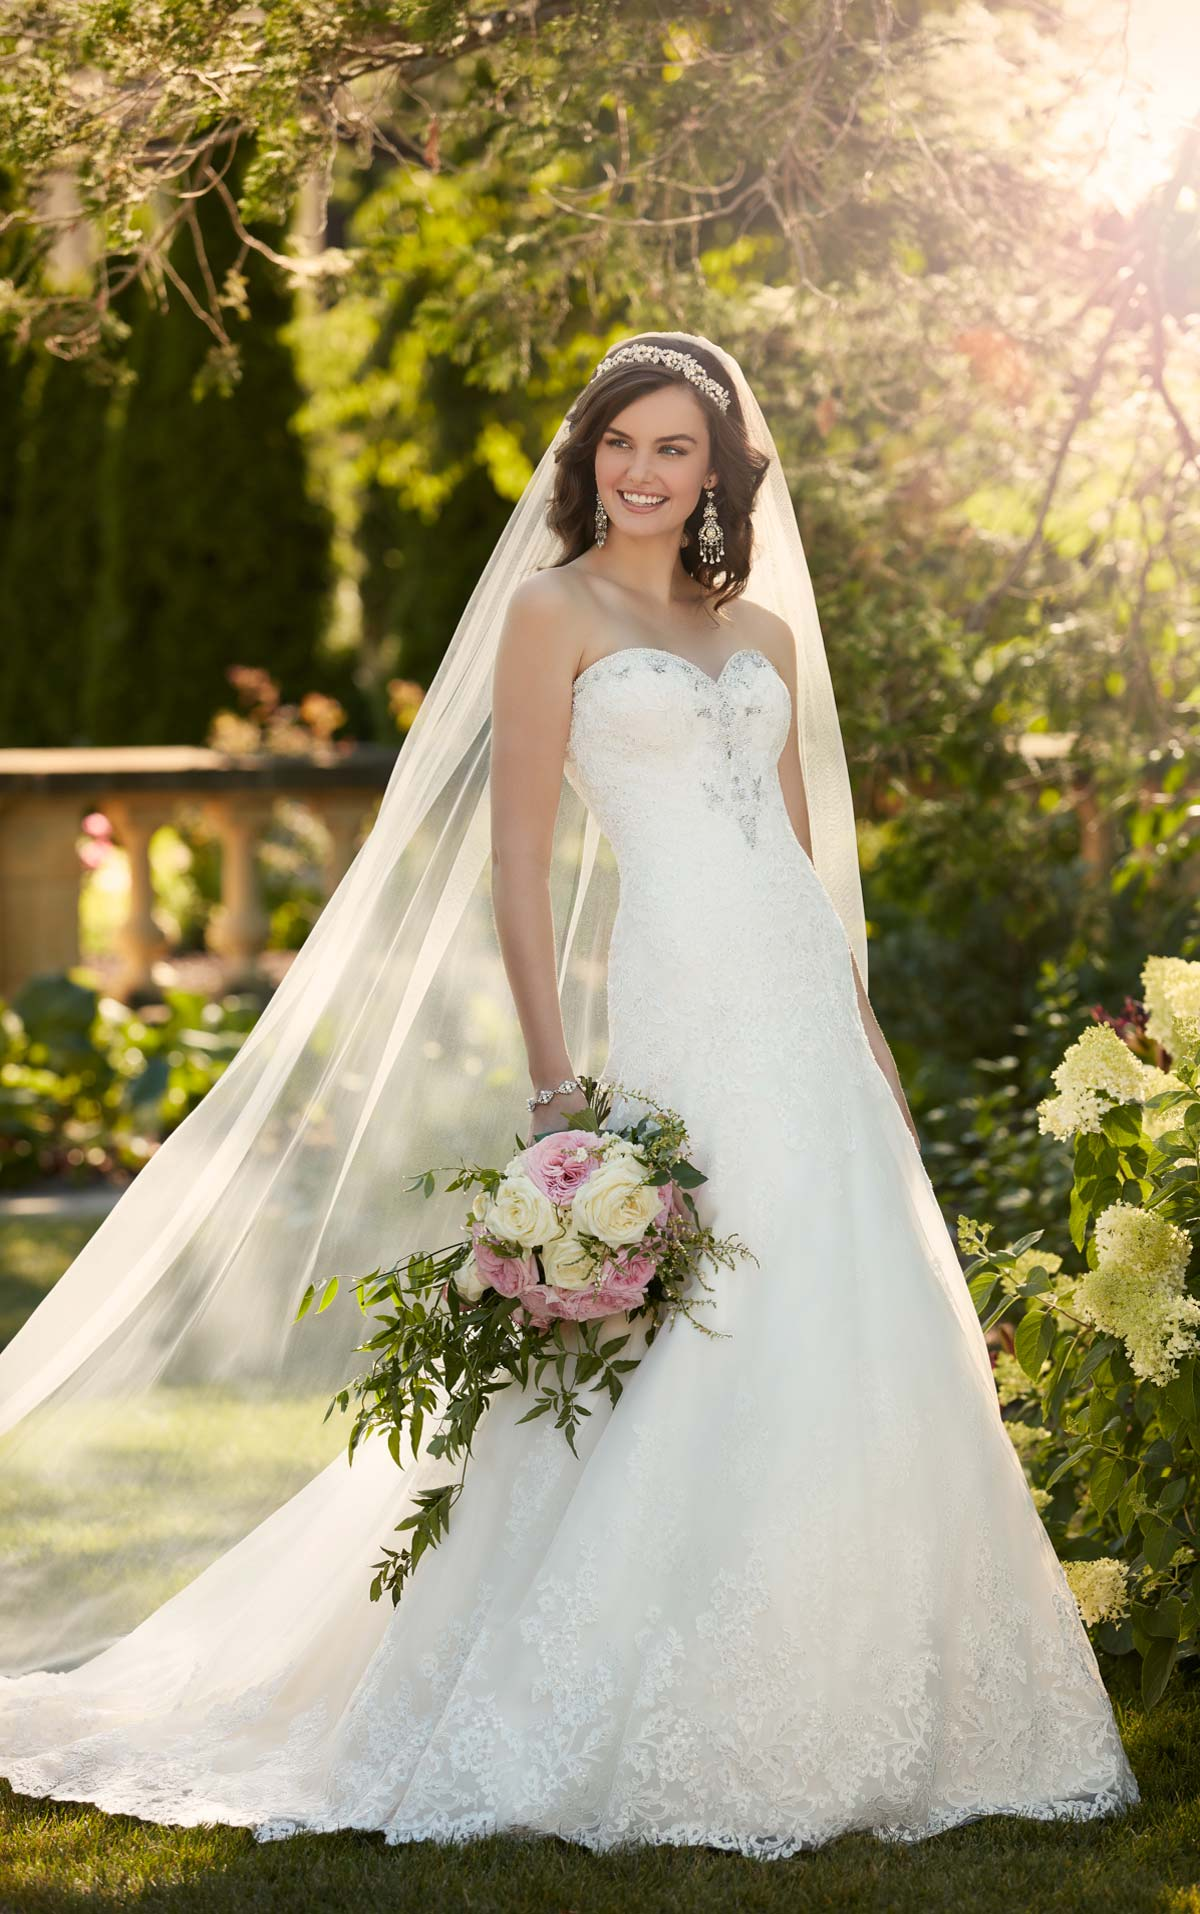 essence of australia wedding dresses prices photo - 1